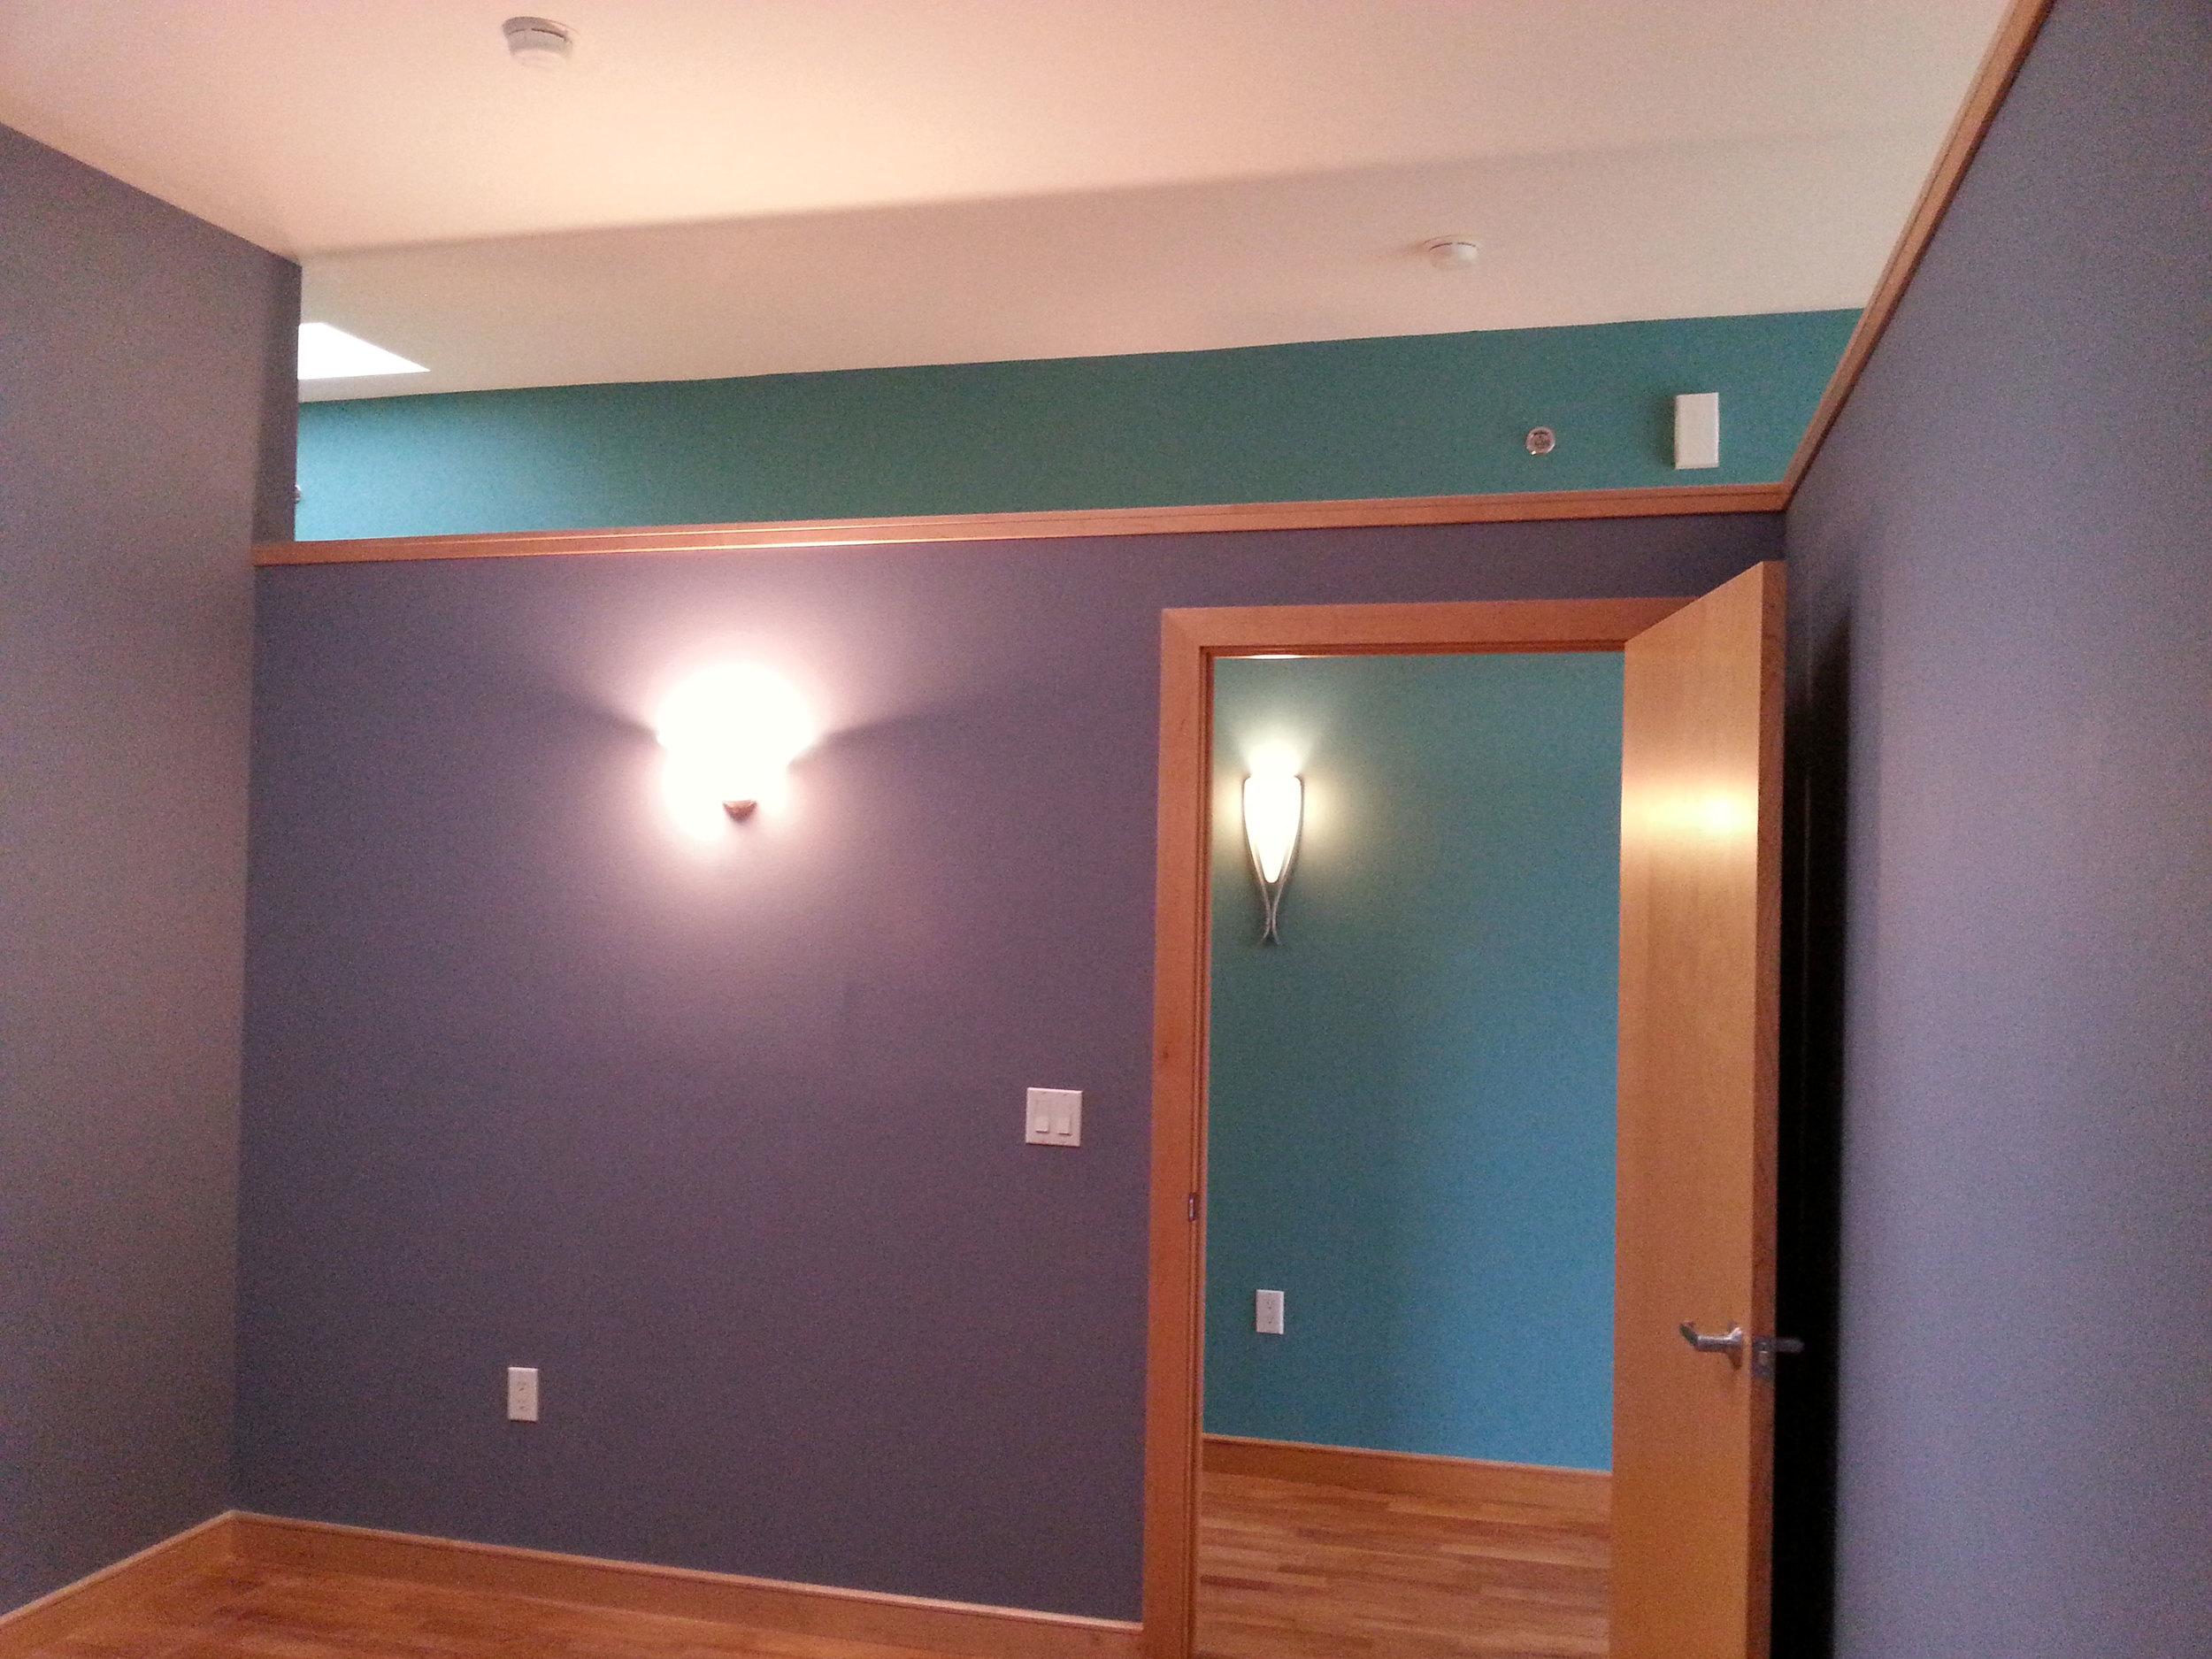 painting-madisons-4th-ward-lofts.jpg